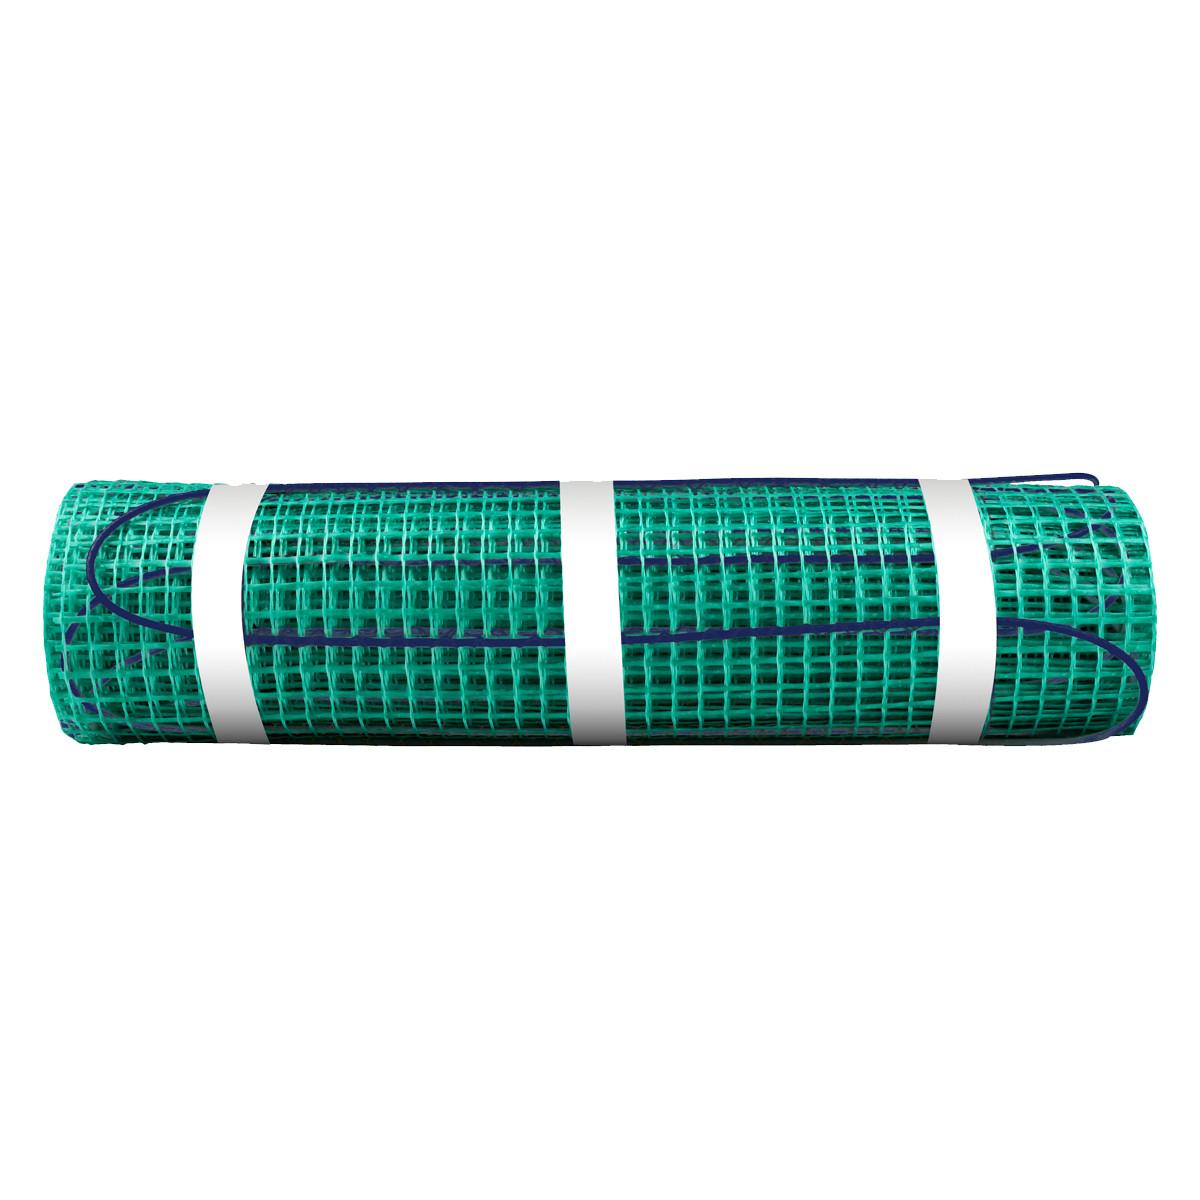 WarmlyYours TRT240-1.5x22 TempZone 240V 2.1A 1.5 Foot x 22 Foot Flex Roll